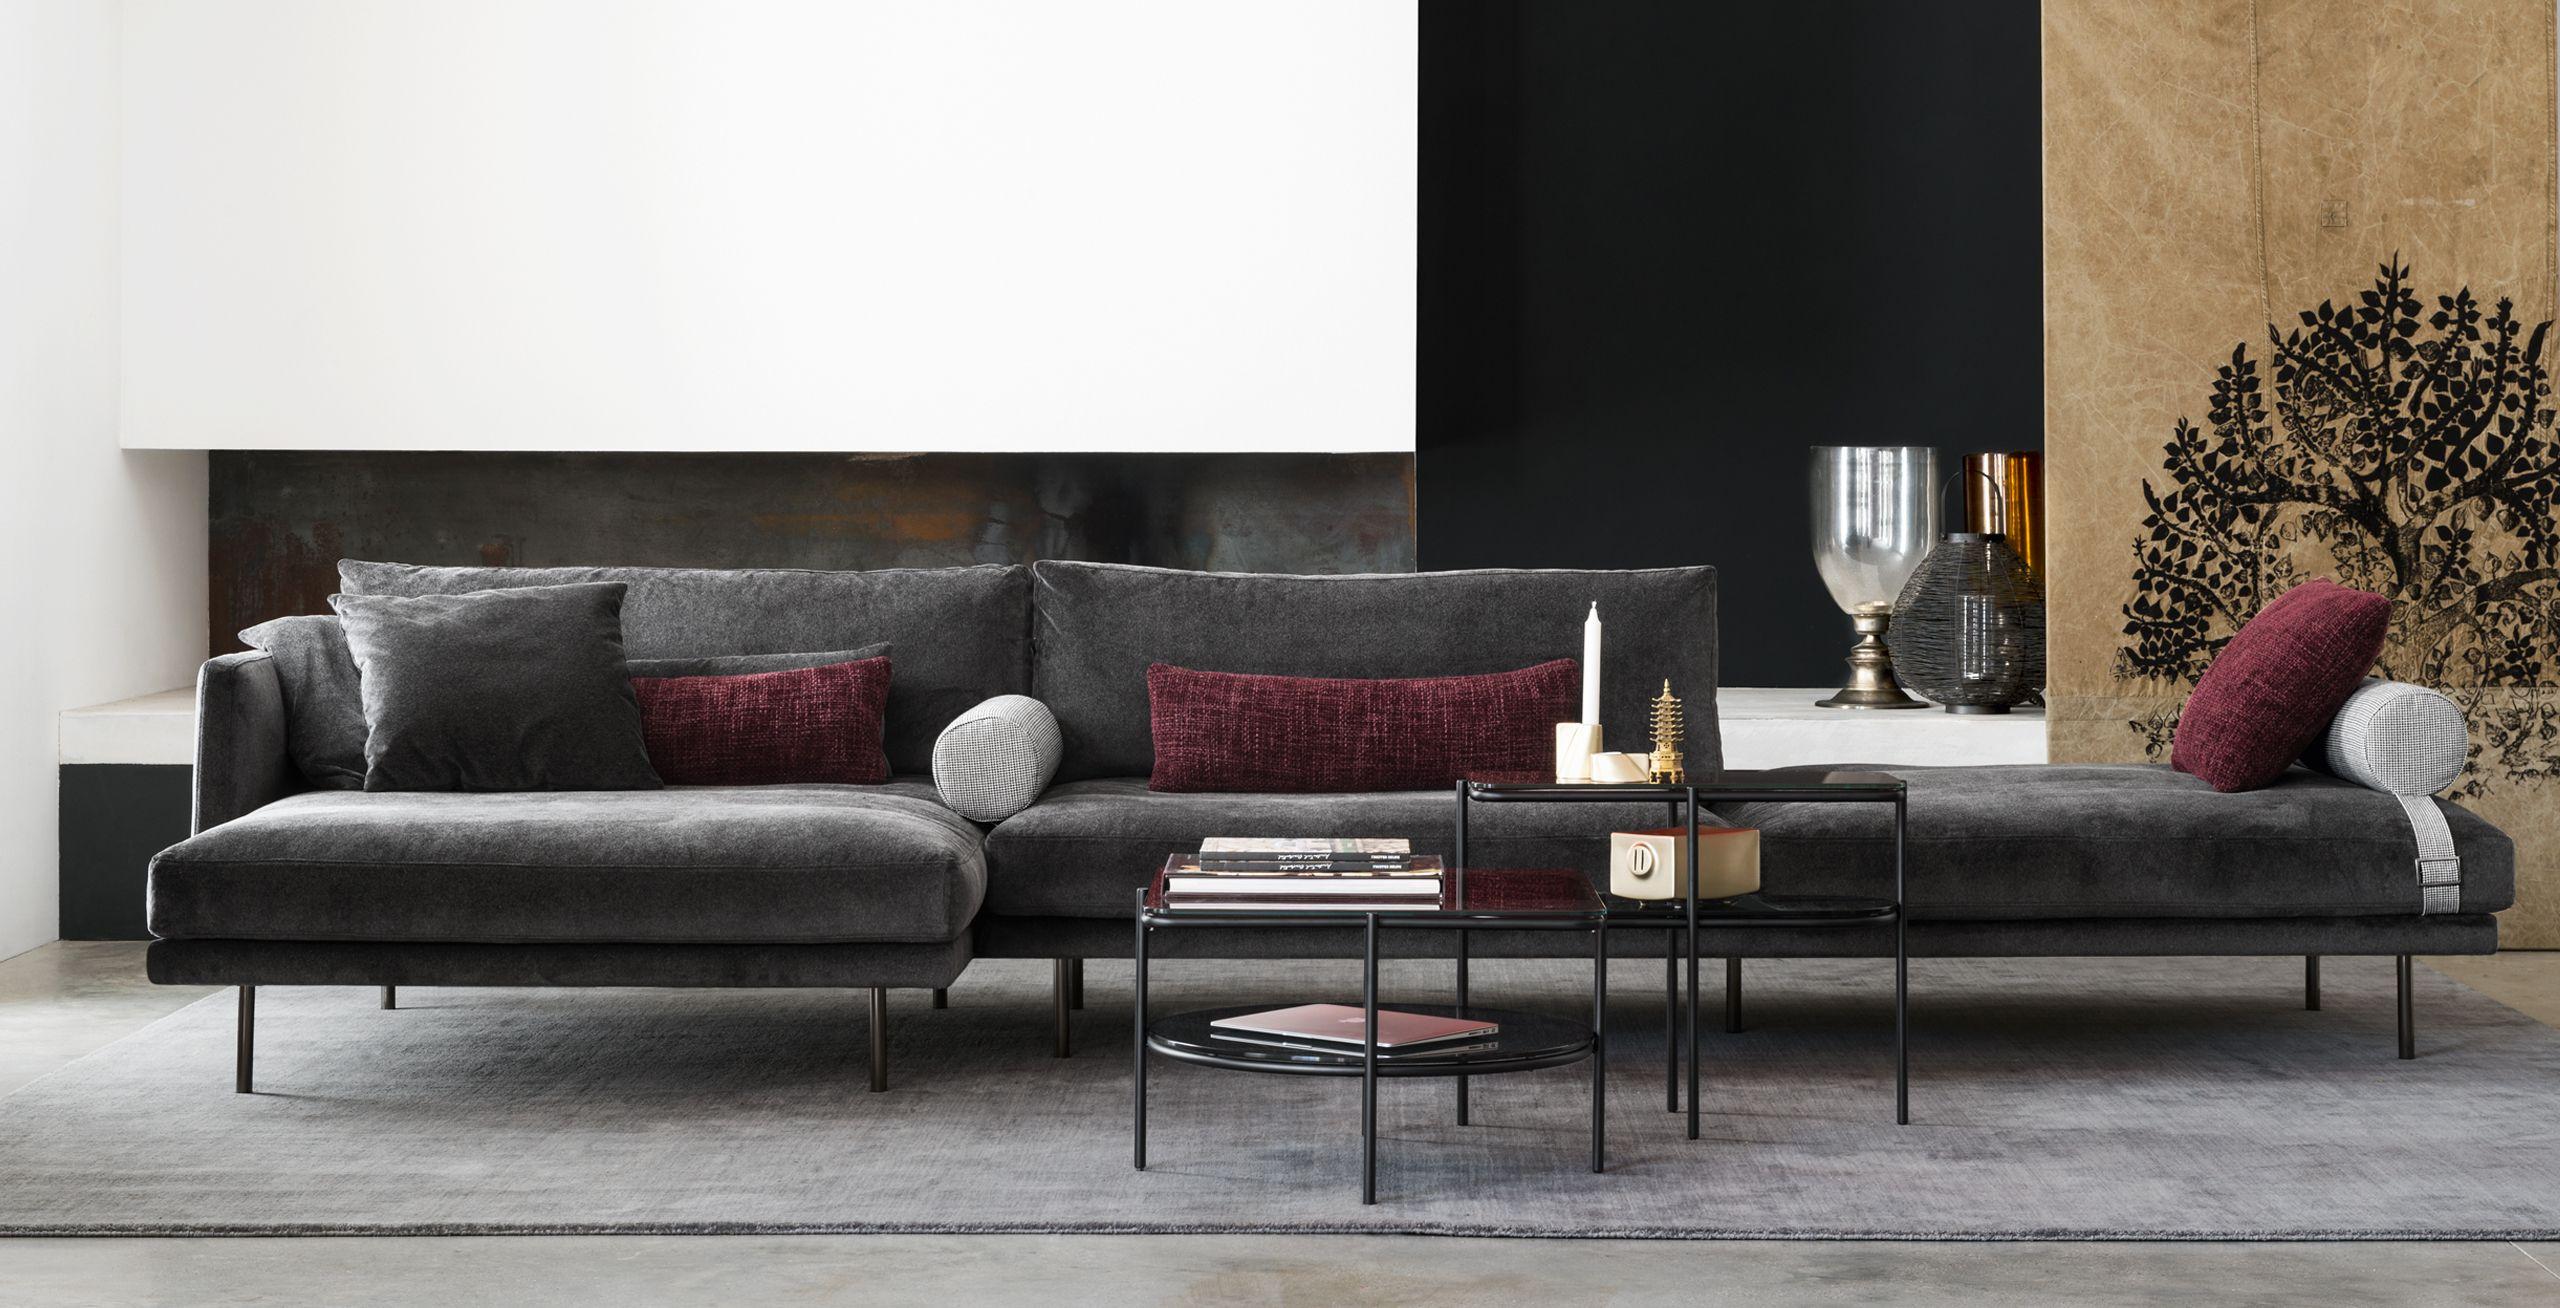 Home Calligaris Mobilier Design Canape Italien Meuble Maison